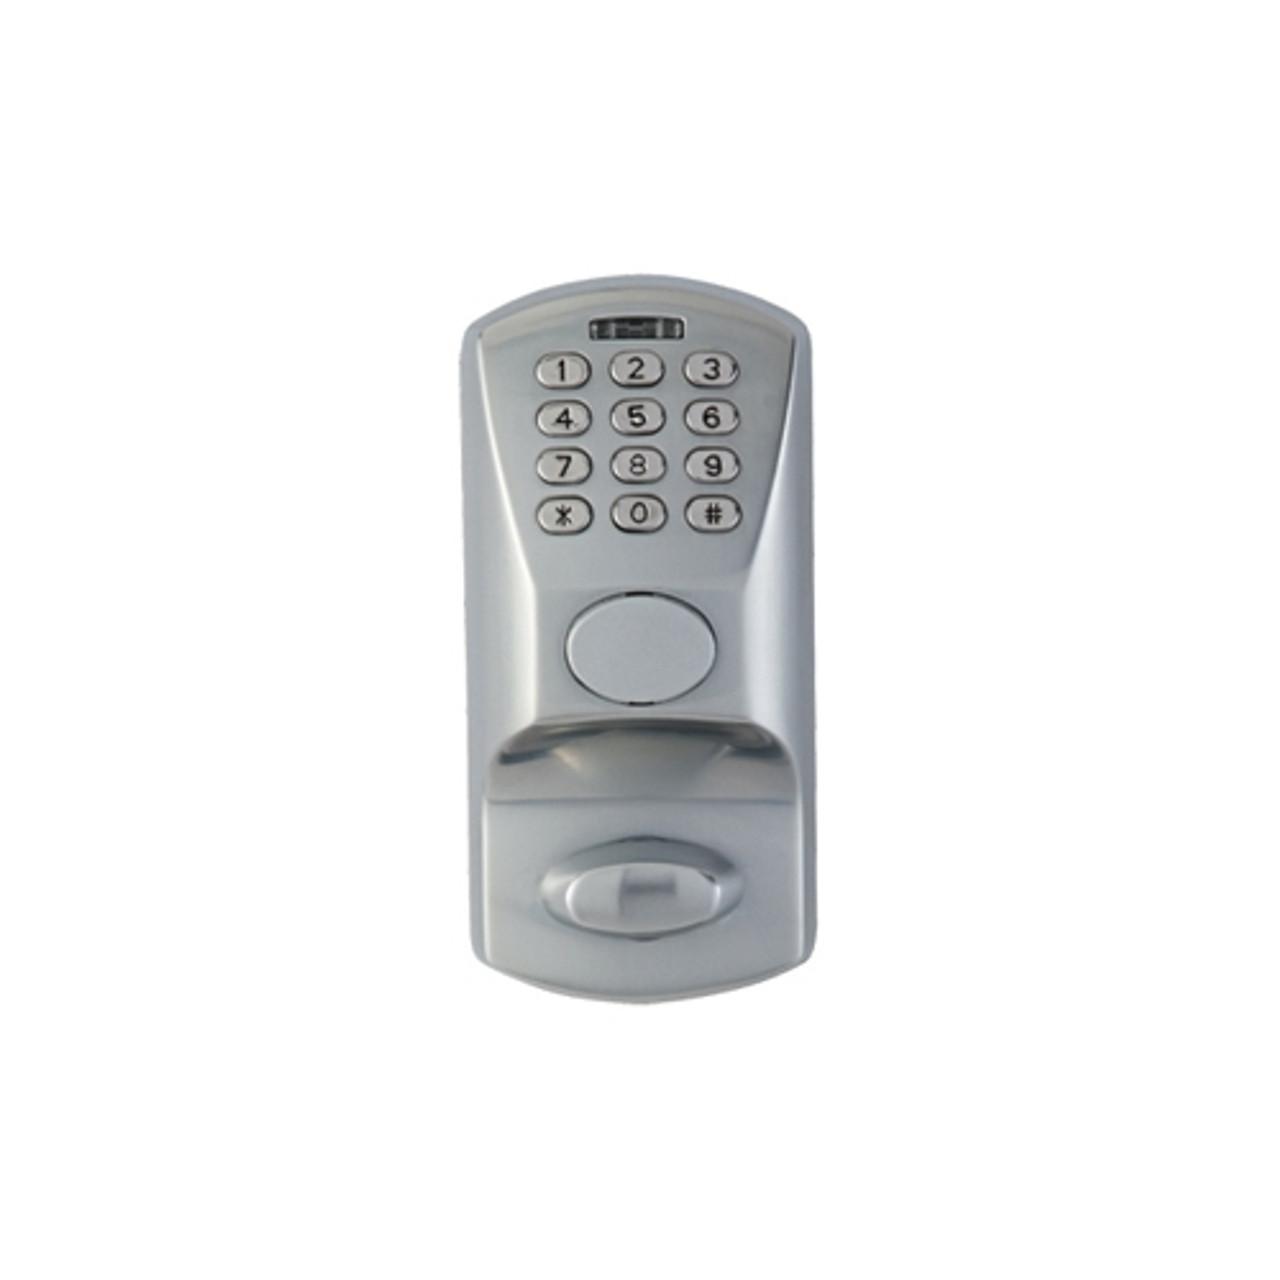 kaba e plex e1502 electronic deadbolt lock with key override kaba power supply wiring diagrams [ 1280 x 1280 Pixel ]